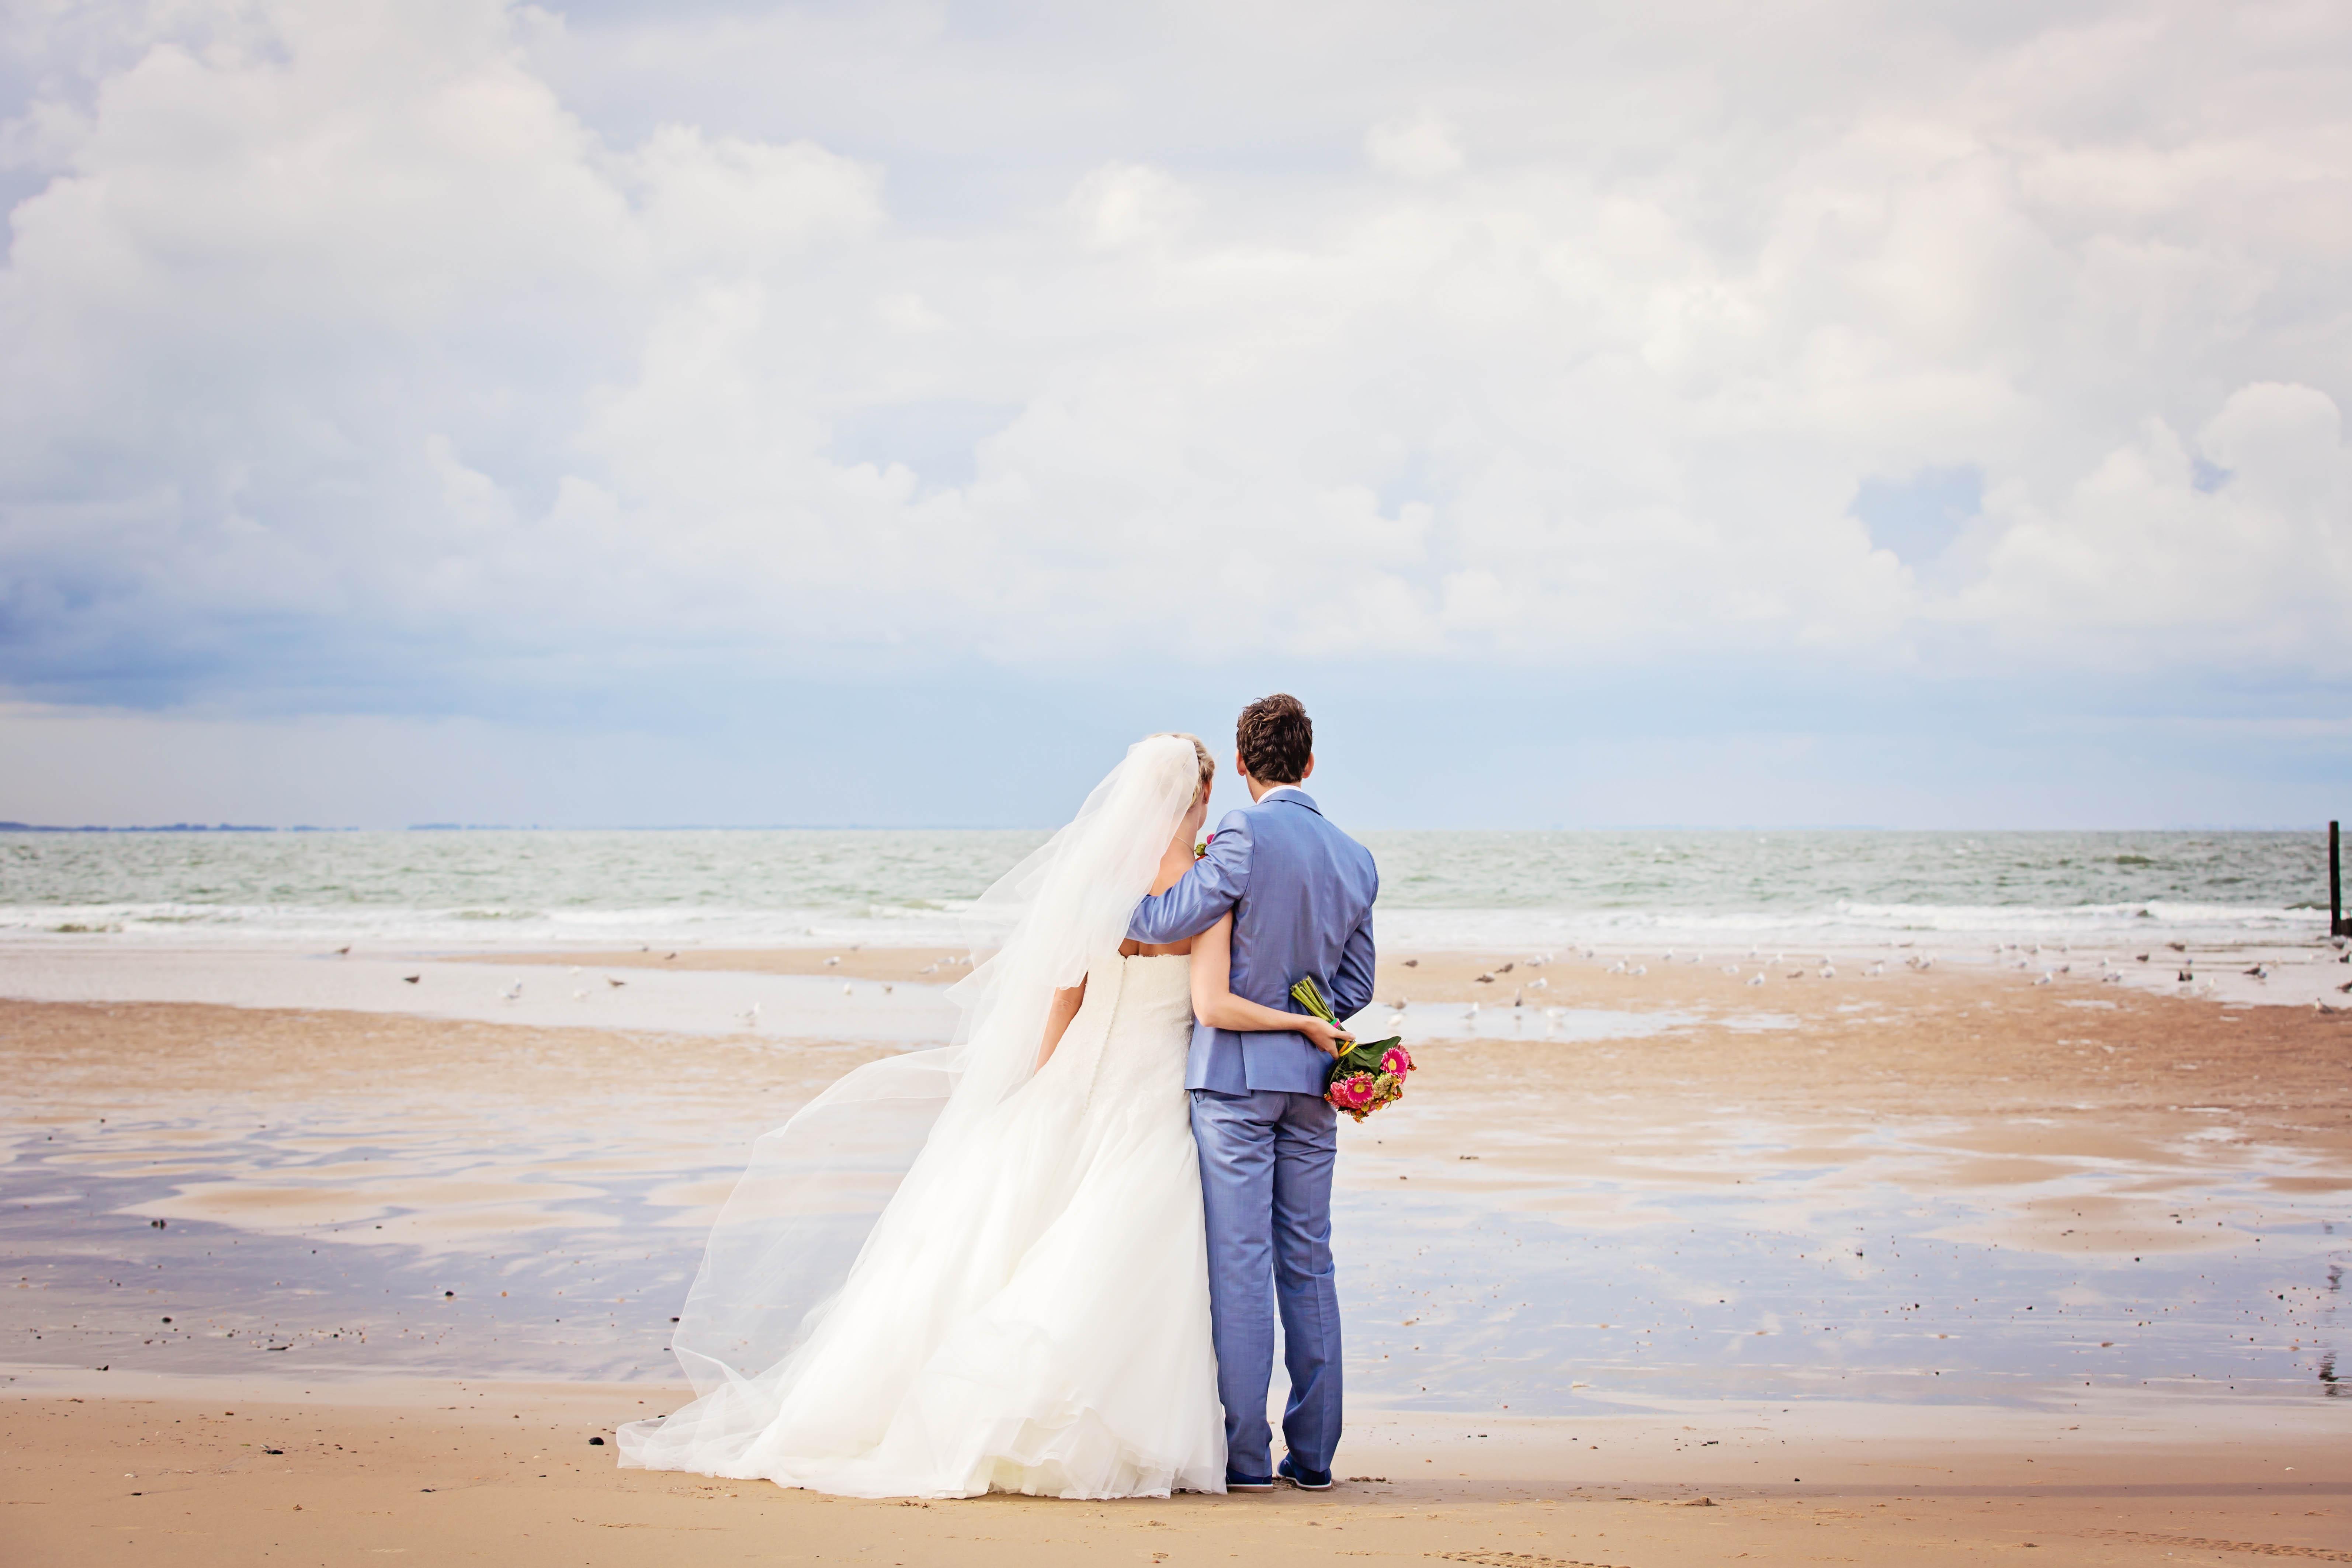 Photographe de mariage | Normandie |